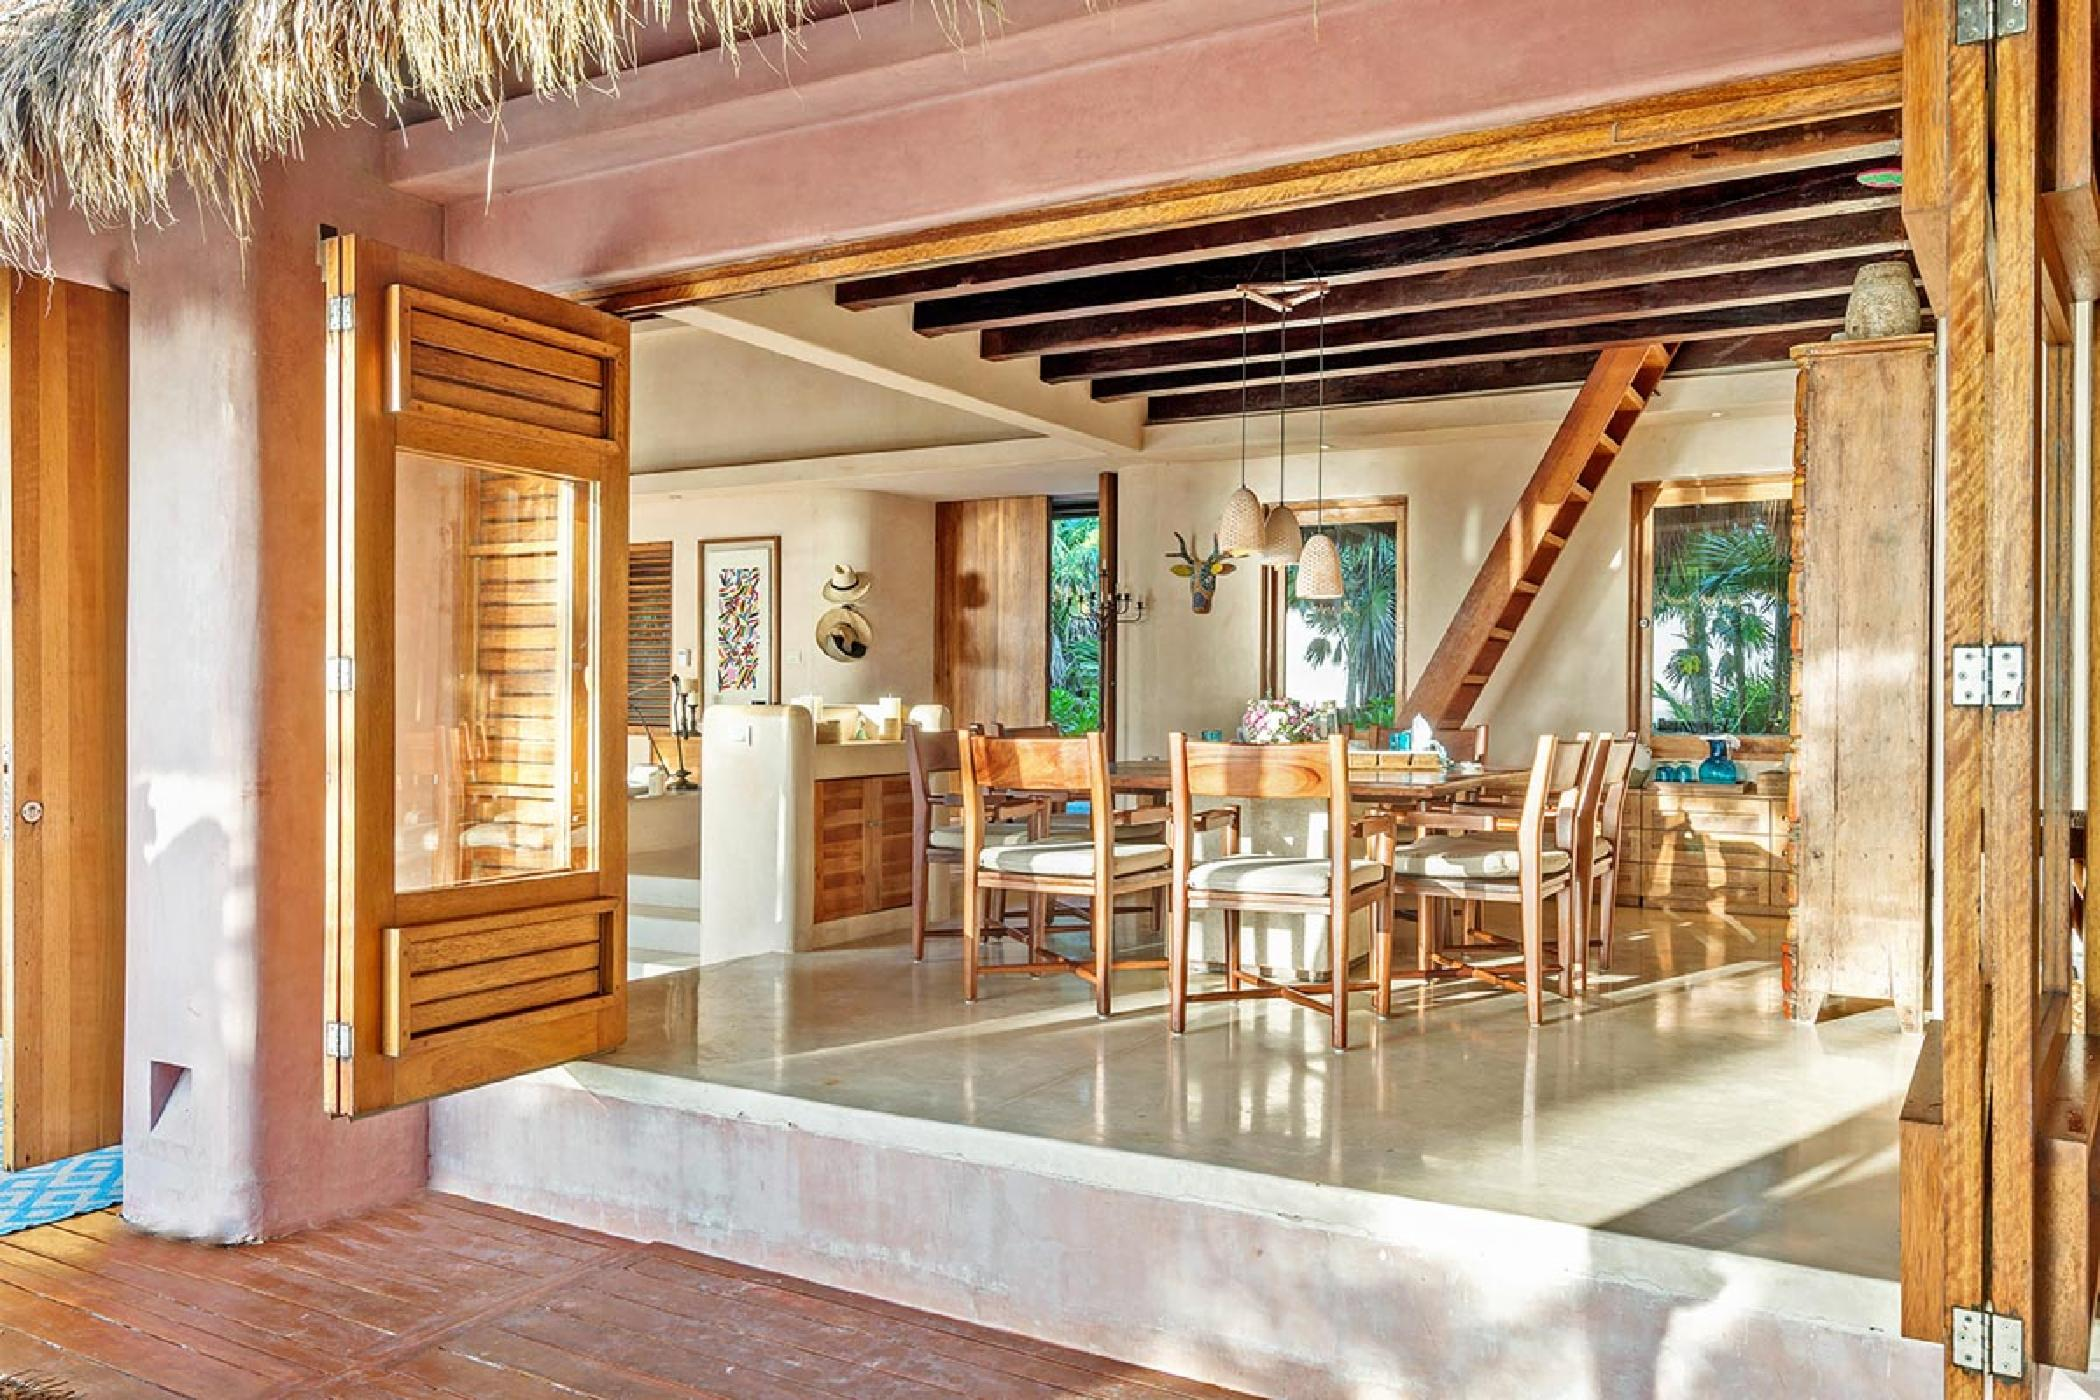 Maya_Luxe_Riviera_Maya_Luxury_Villas_Experiences_Sian_Kaan_Tulum_4_Bedrooms_Casa_Cantarena_10.jpg